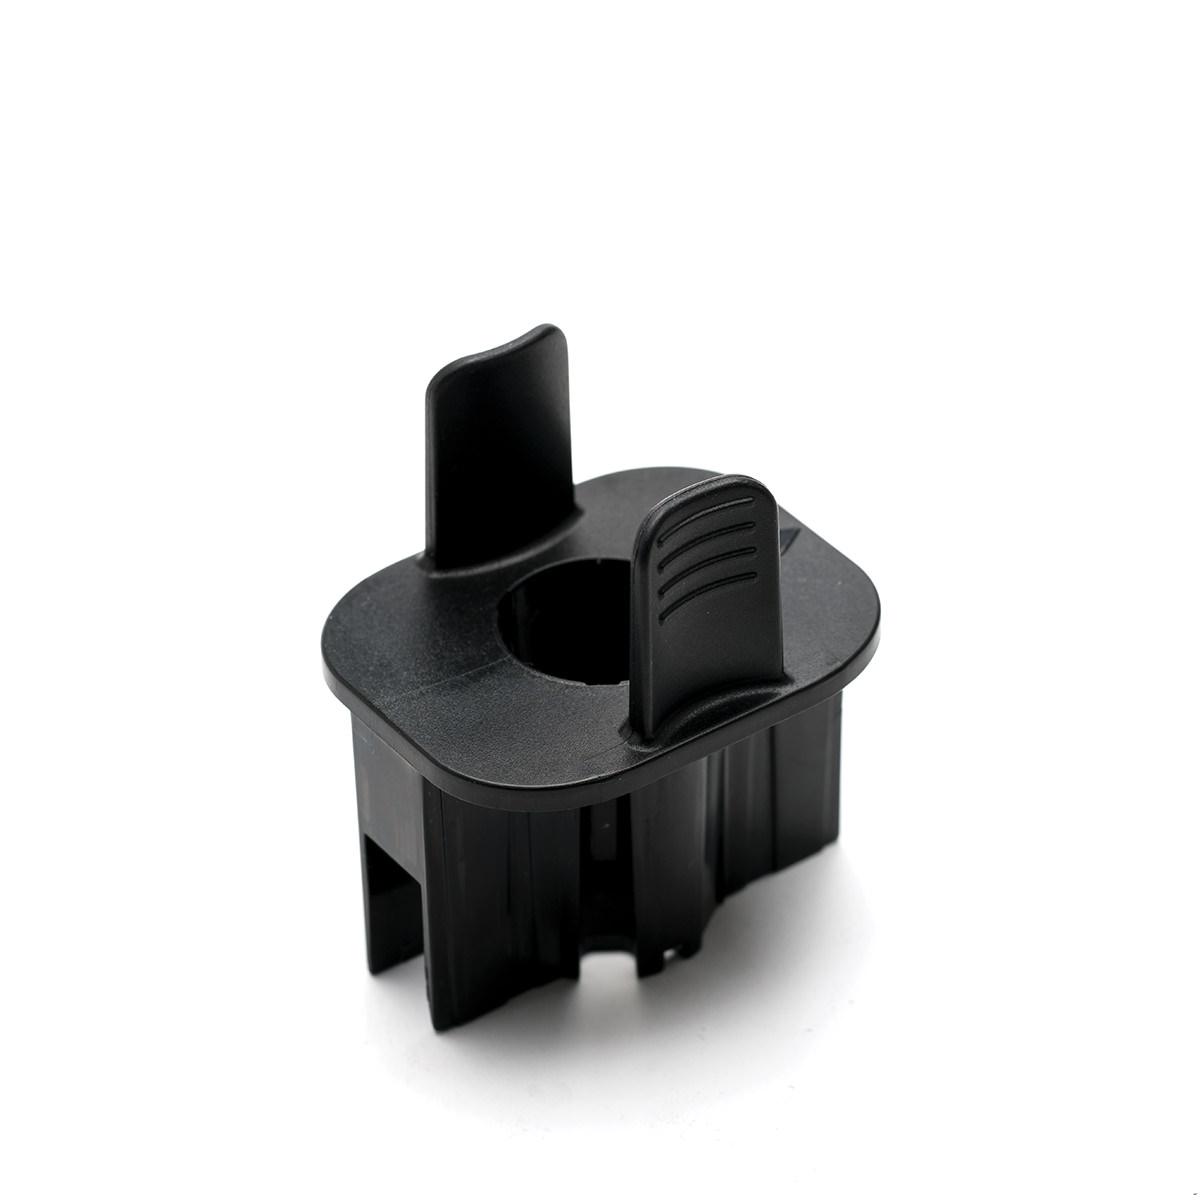 HI801_Cuvette-Insert-Round